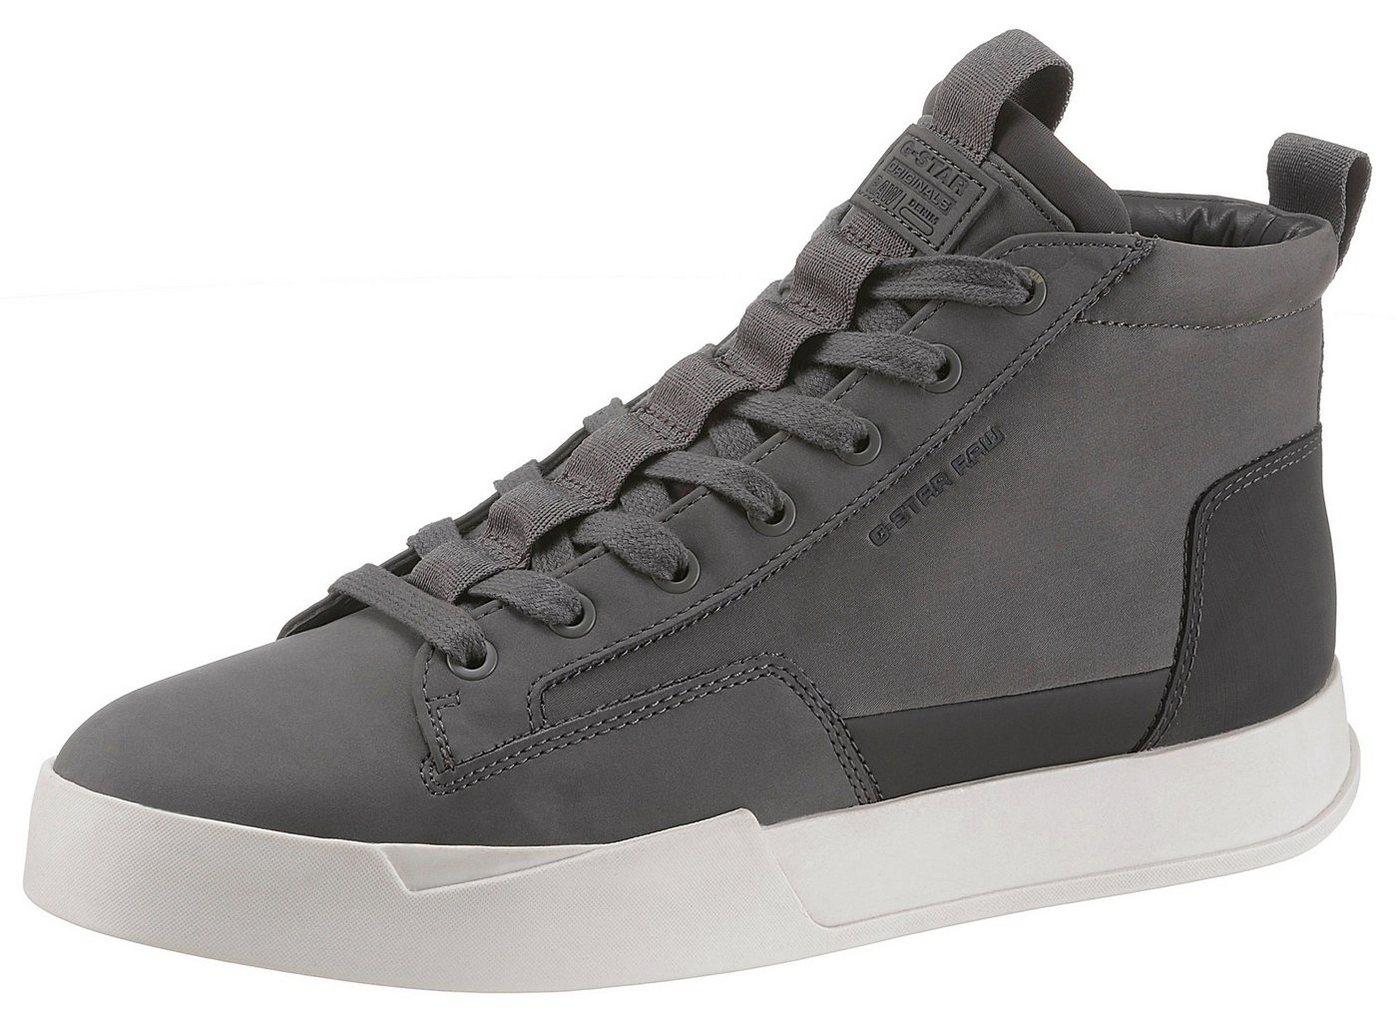 Herren G-Star RAW Rackam Core Mid Sneaker grau | 08719369894374